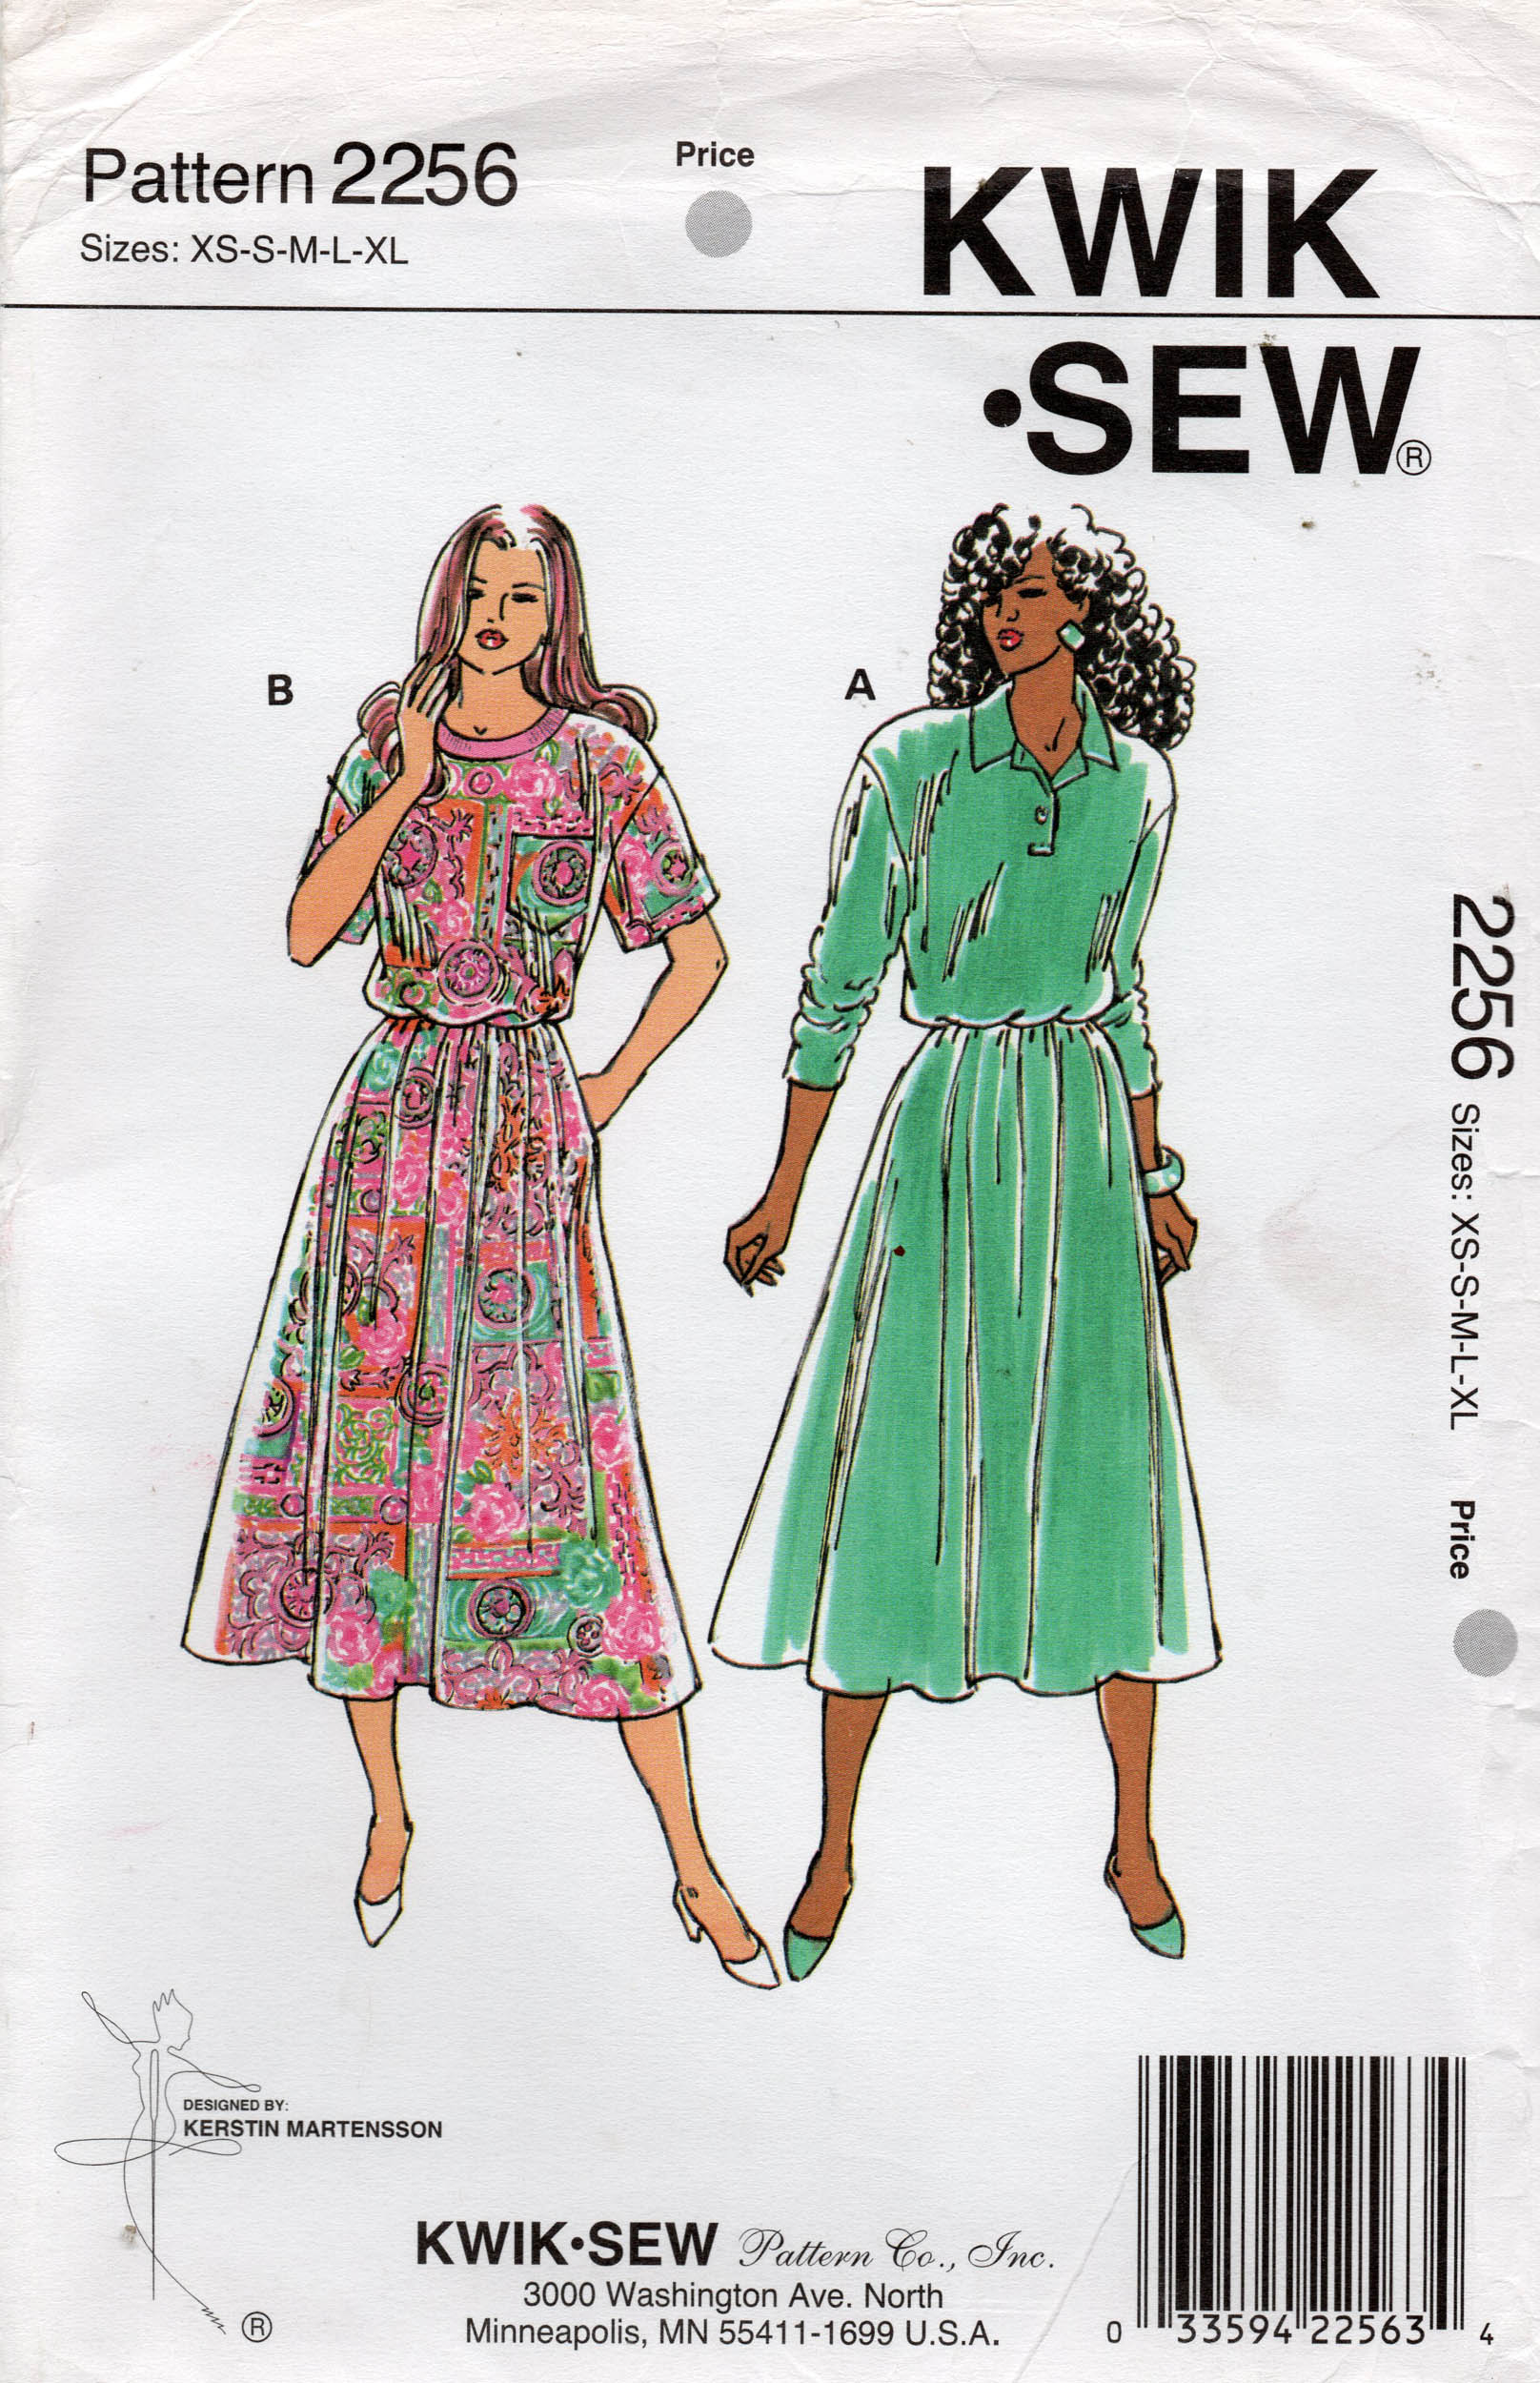 Kwik Sew 2256